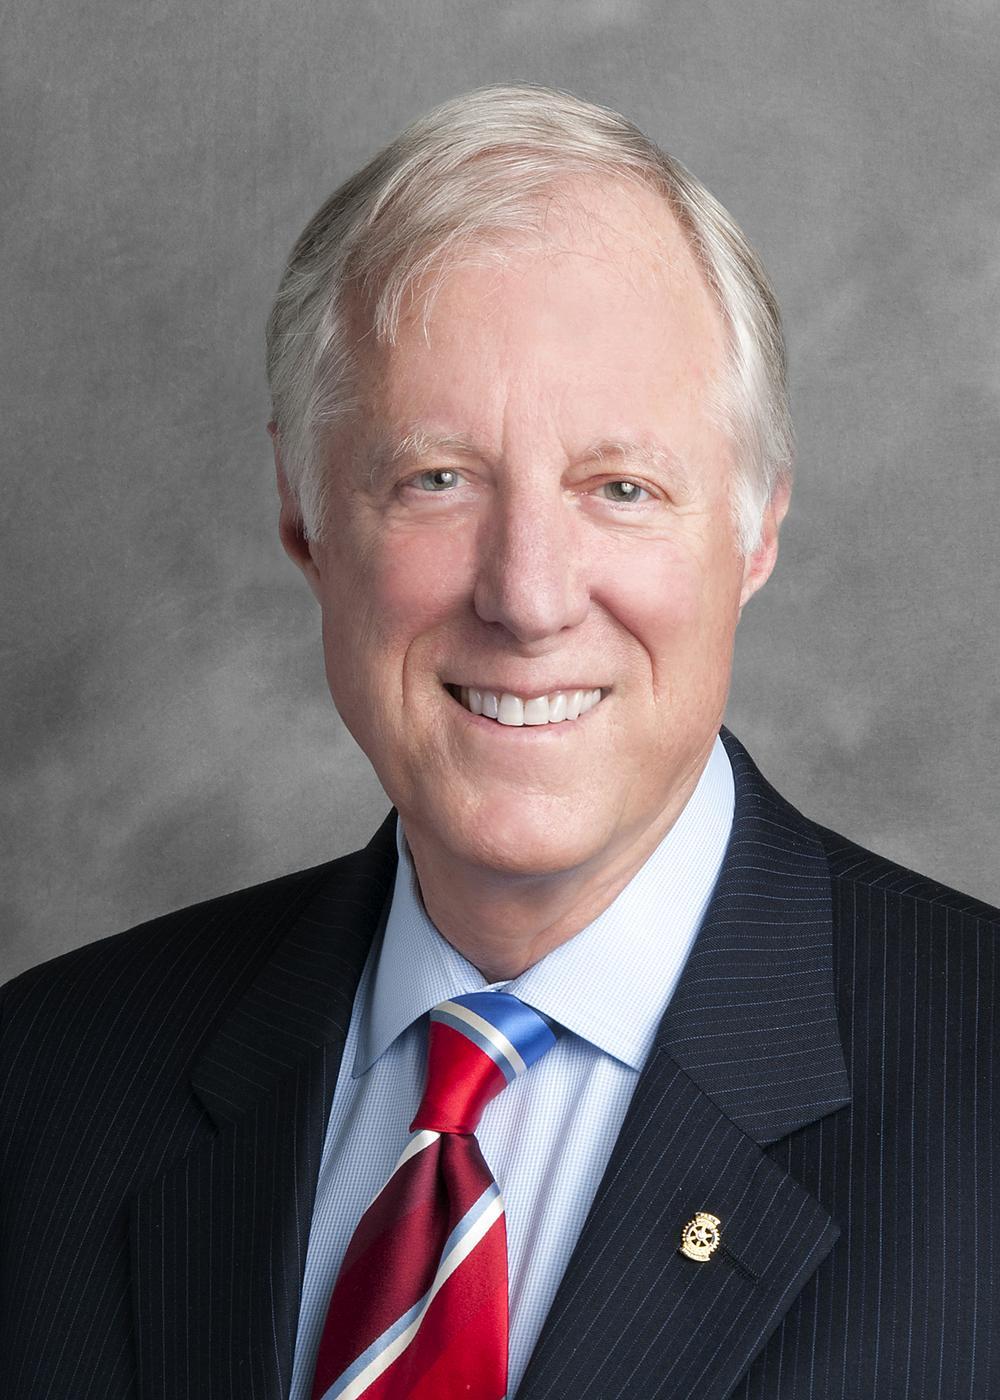 H. Vincent Clanton, MBA, CLU, CFP® Photo